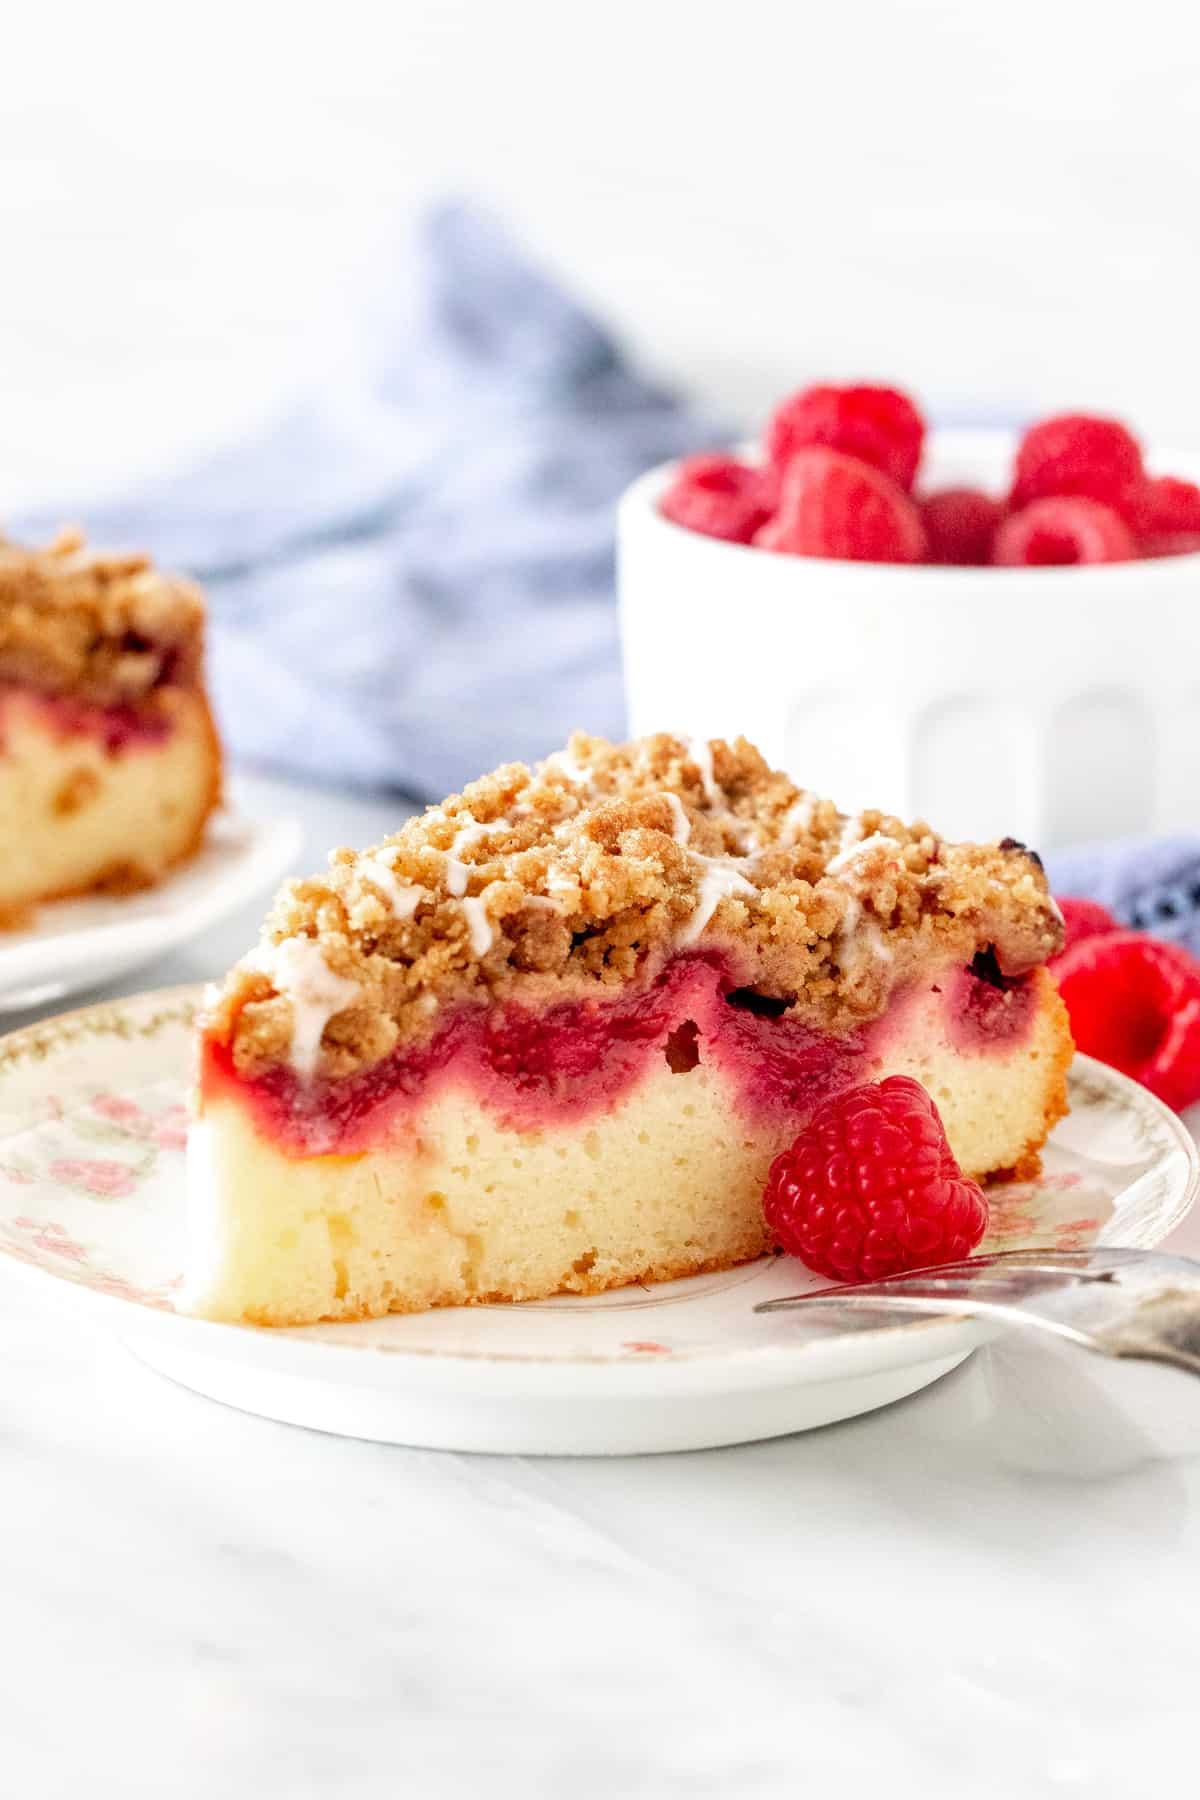 Slice of raspberry coffee cake